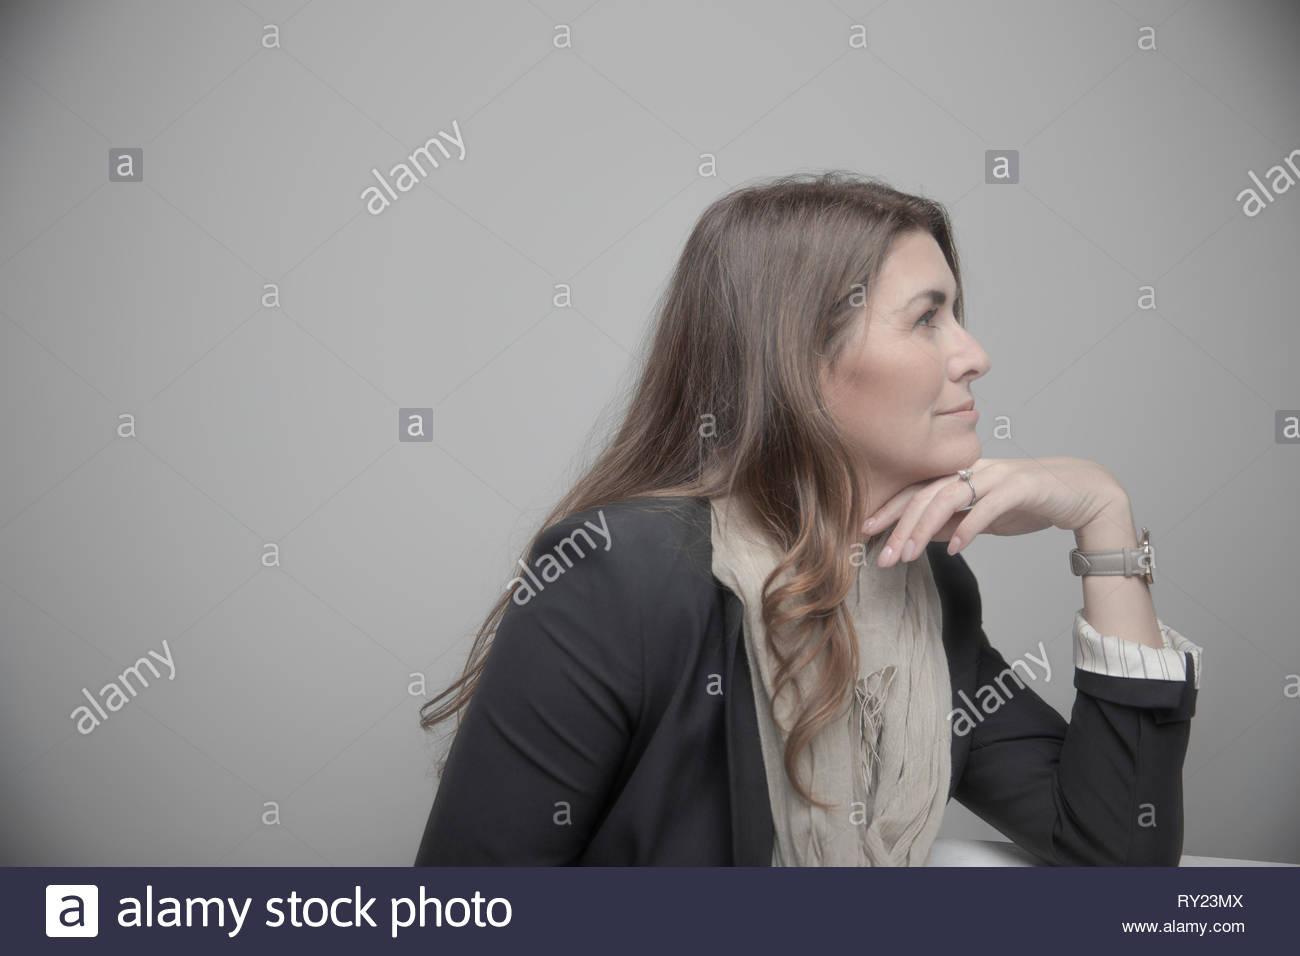 Retrato de perfil seguro hermosa morenita mujer mirando lejos Imagen De Stock